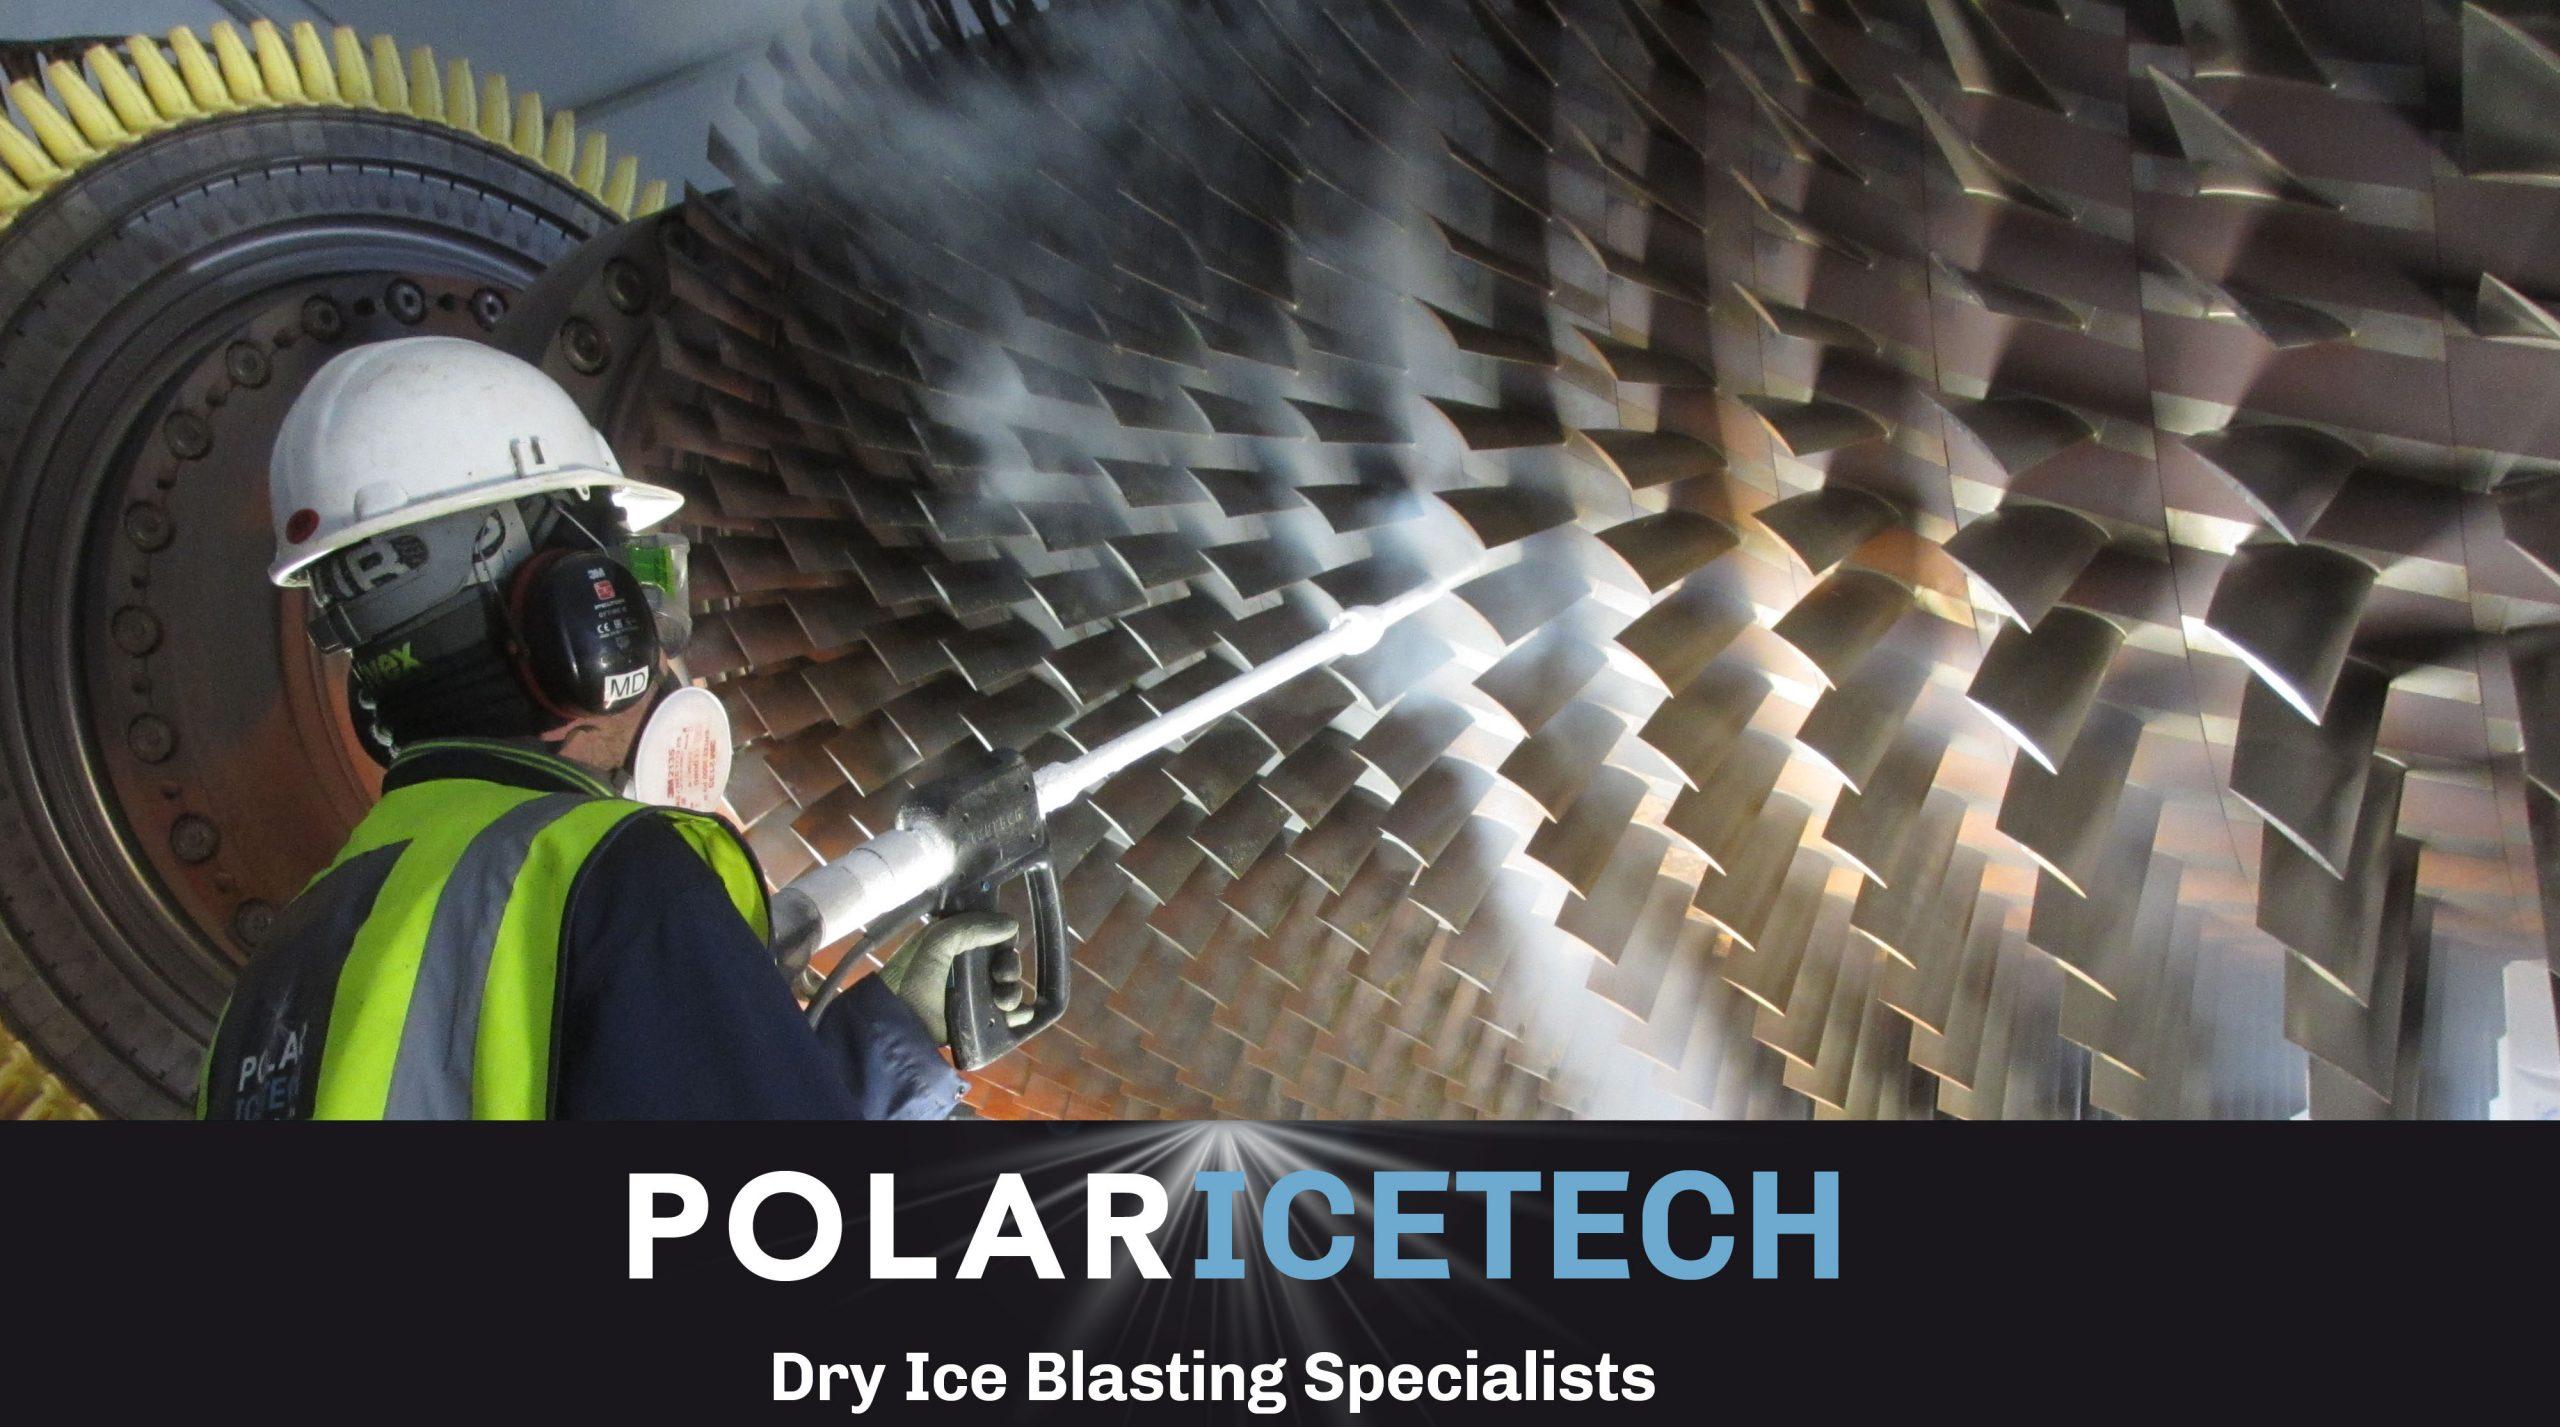 Polar IceTech